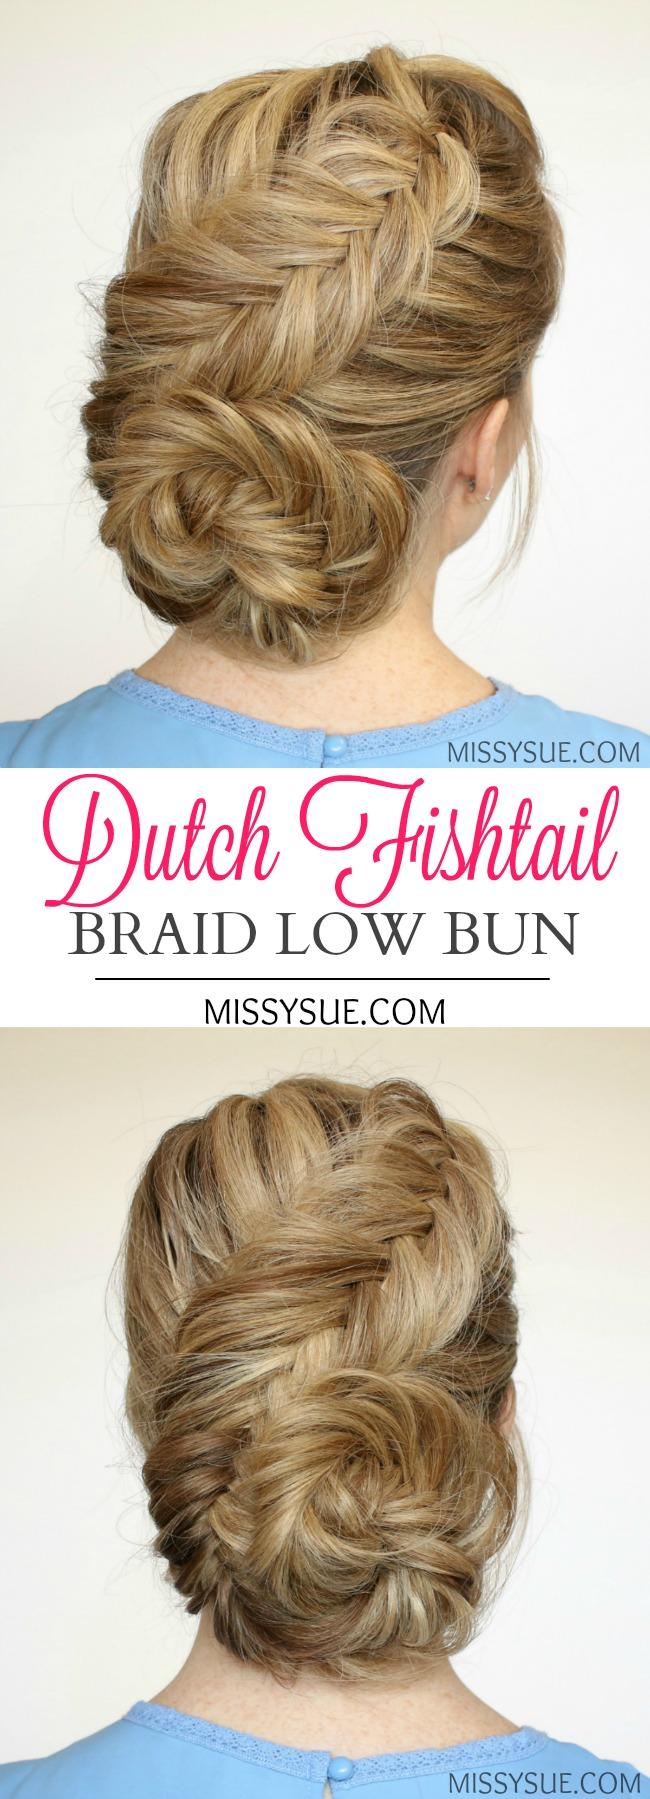 dutch-fishtail-low-bun-tutorial-2